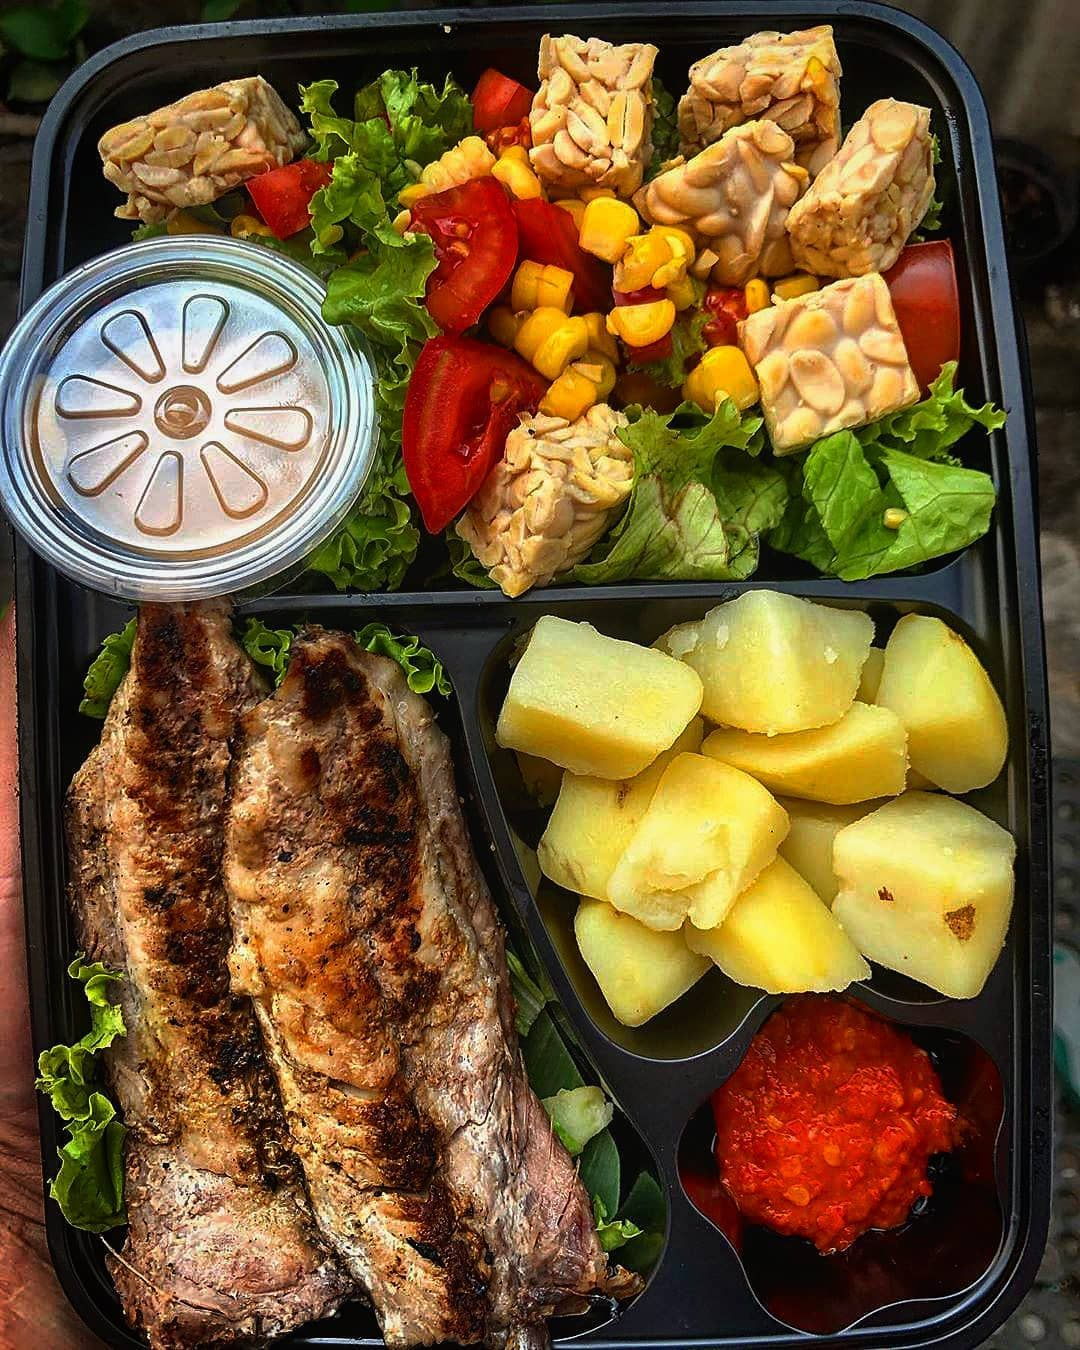 Diet Tanpa Nasi : tanpa, Tanpa, Nocaption, Nocaptionneeded, Dieta, Dietsehat, Sonya6000, Salad,